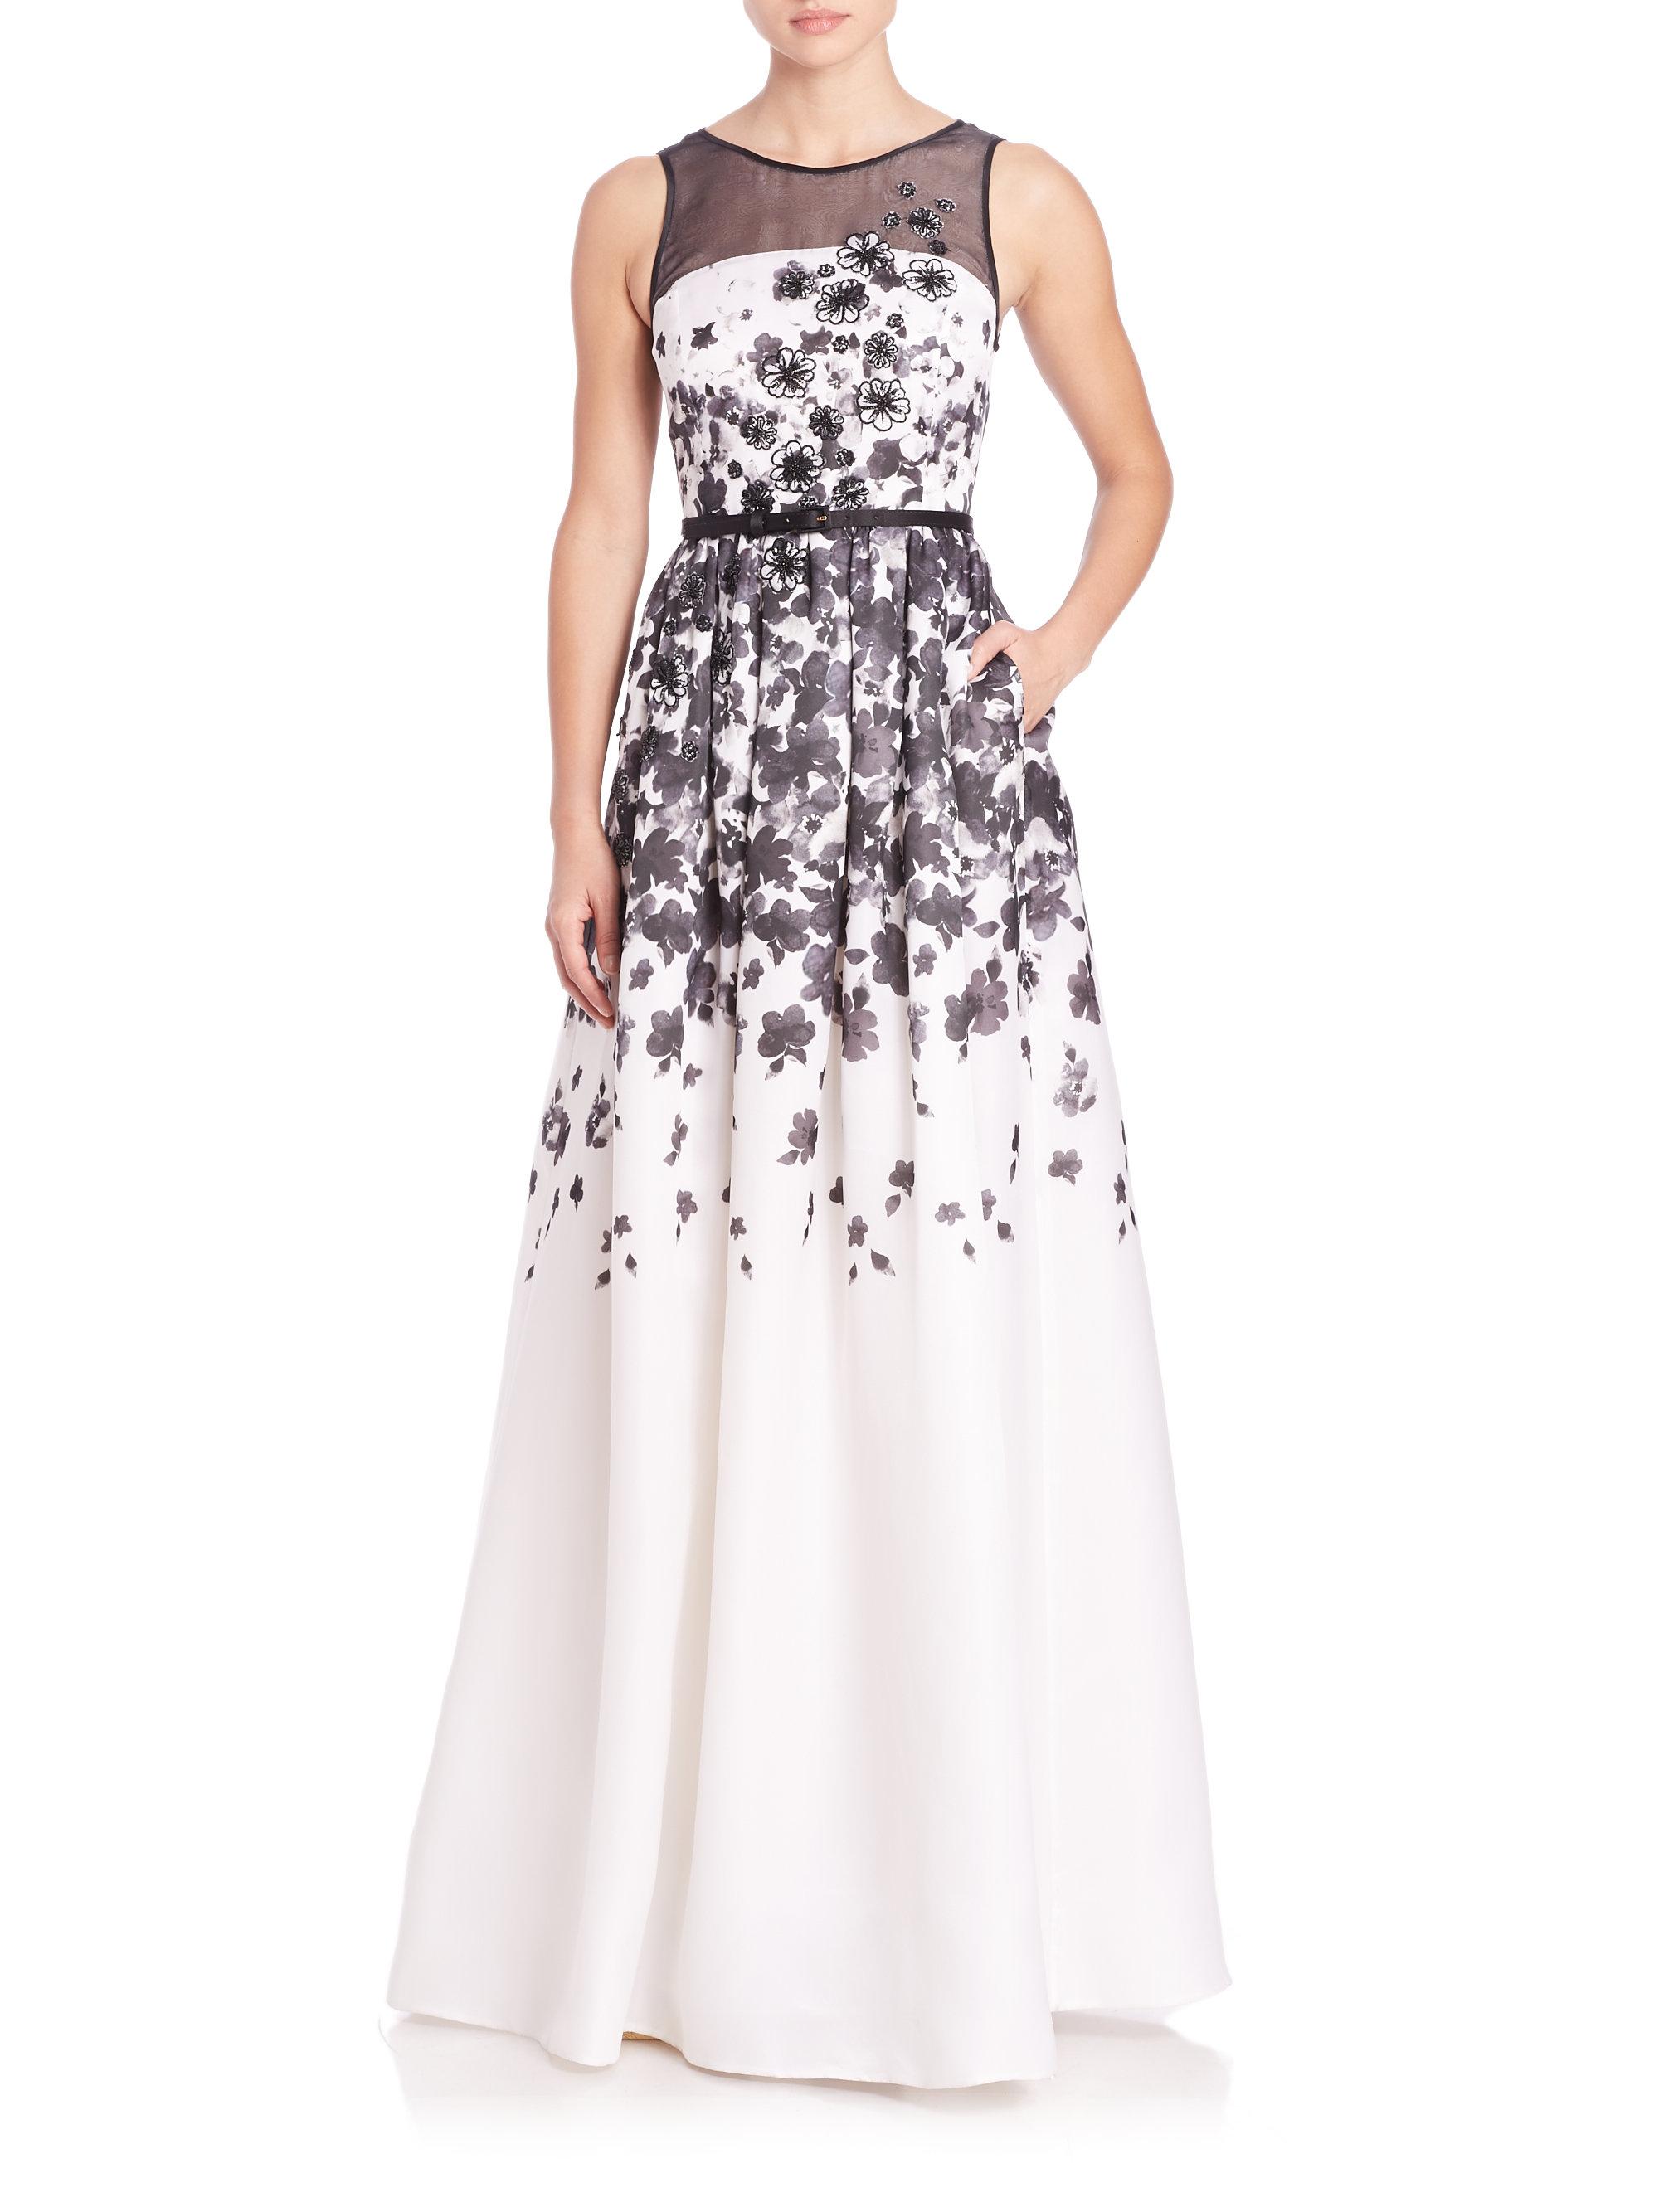 Lyst - St. John Floral Silk Organza Gown in Black